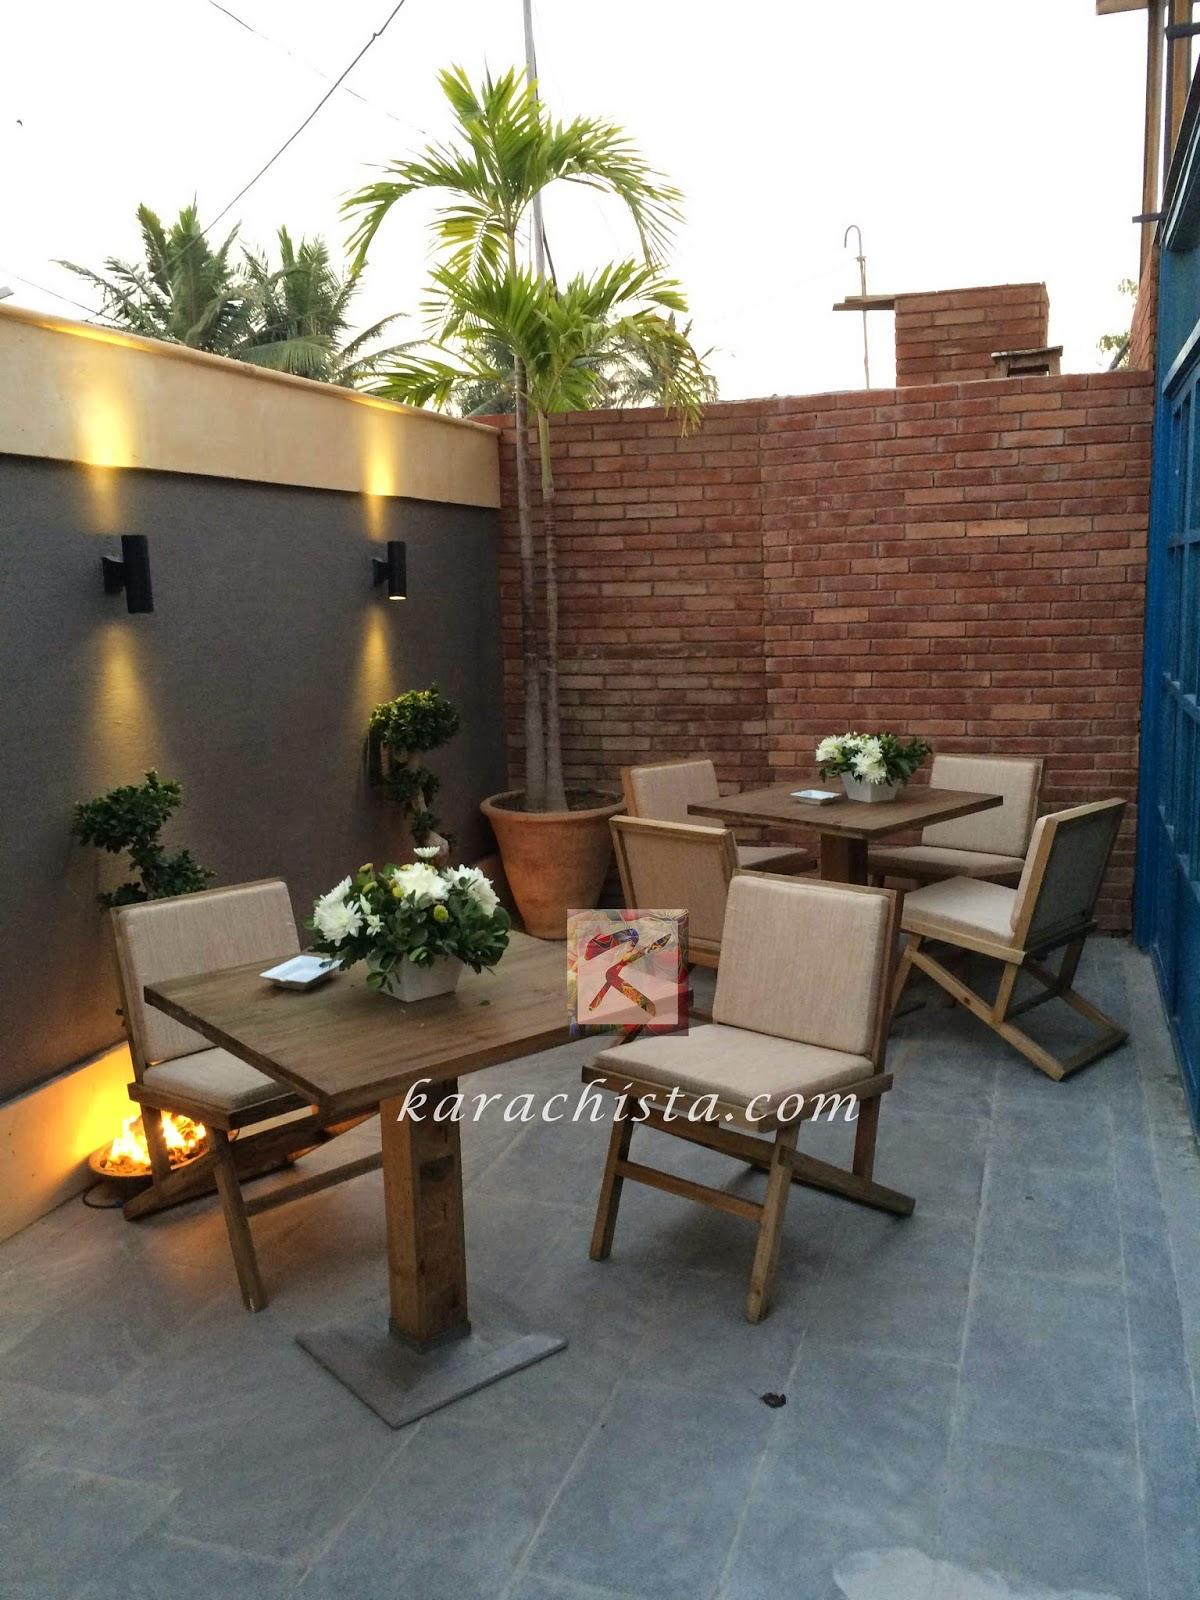 Garden Furniture Karachi mews – karachi's newest upscale cafe reviewed - karachista